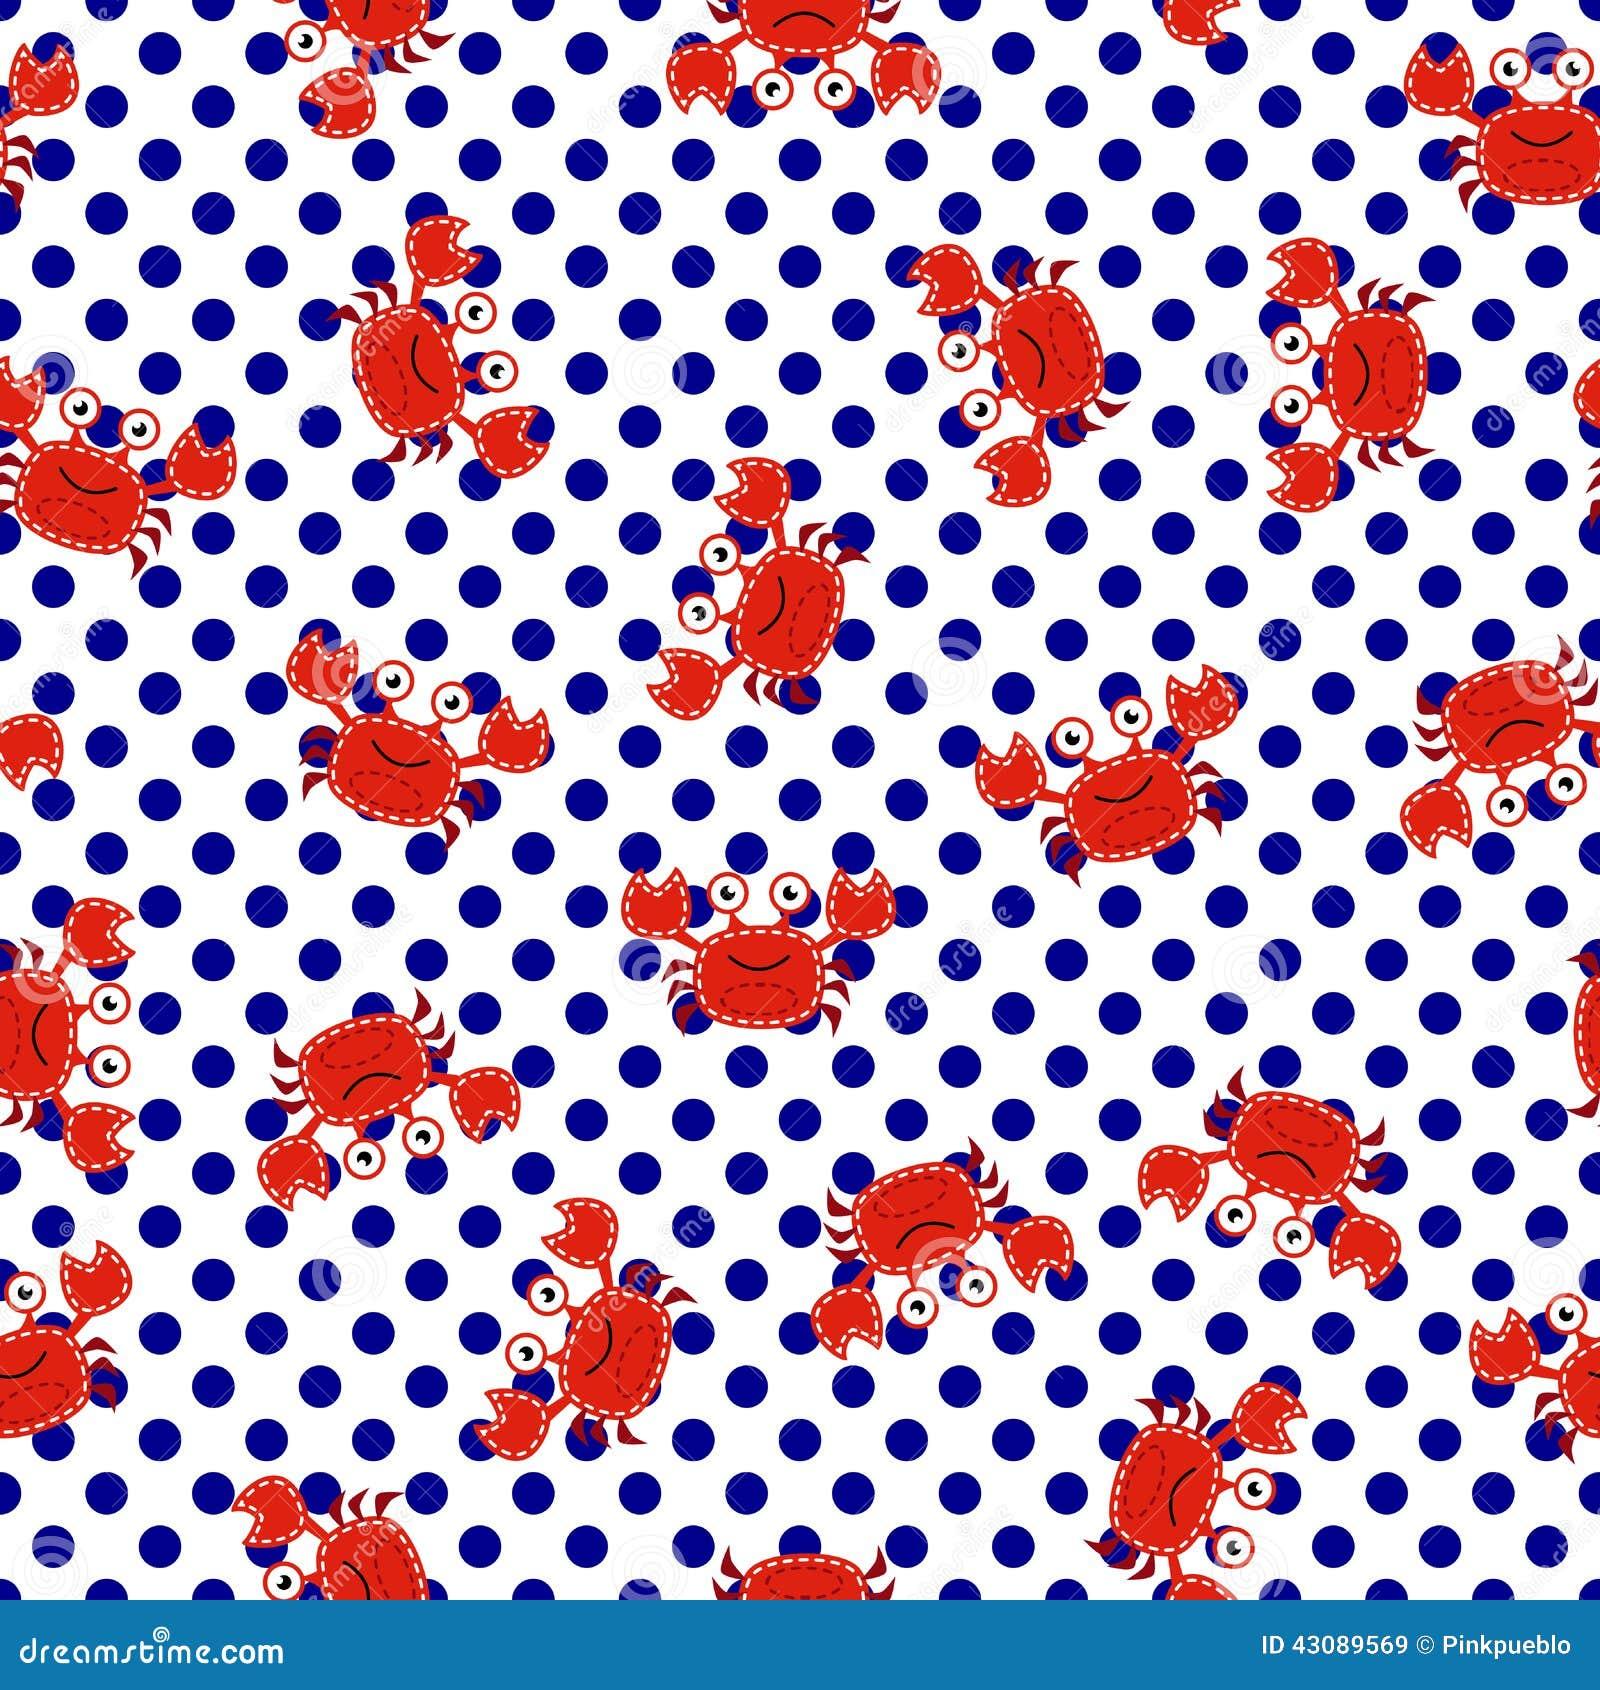 cute nautical desktop wallpaper - photo #27